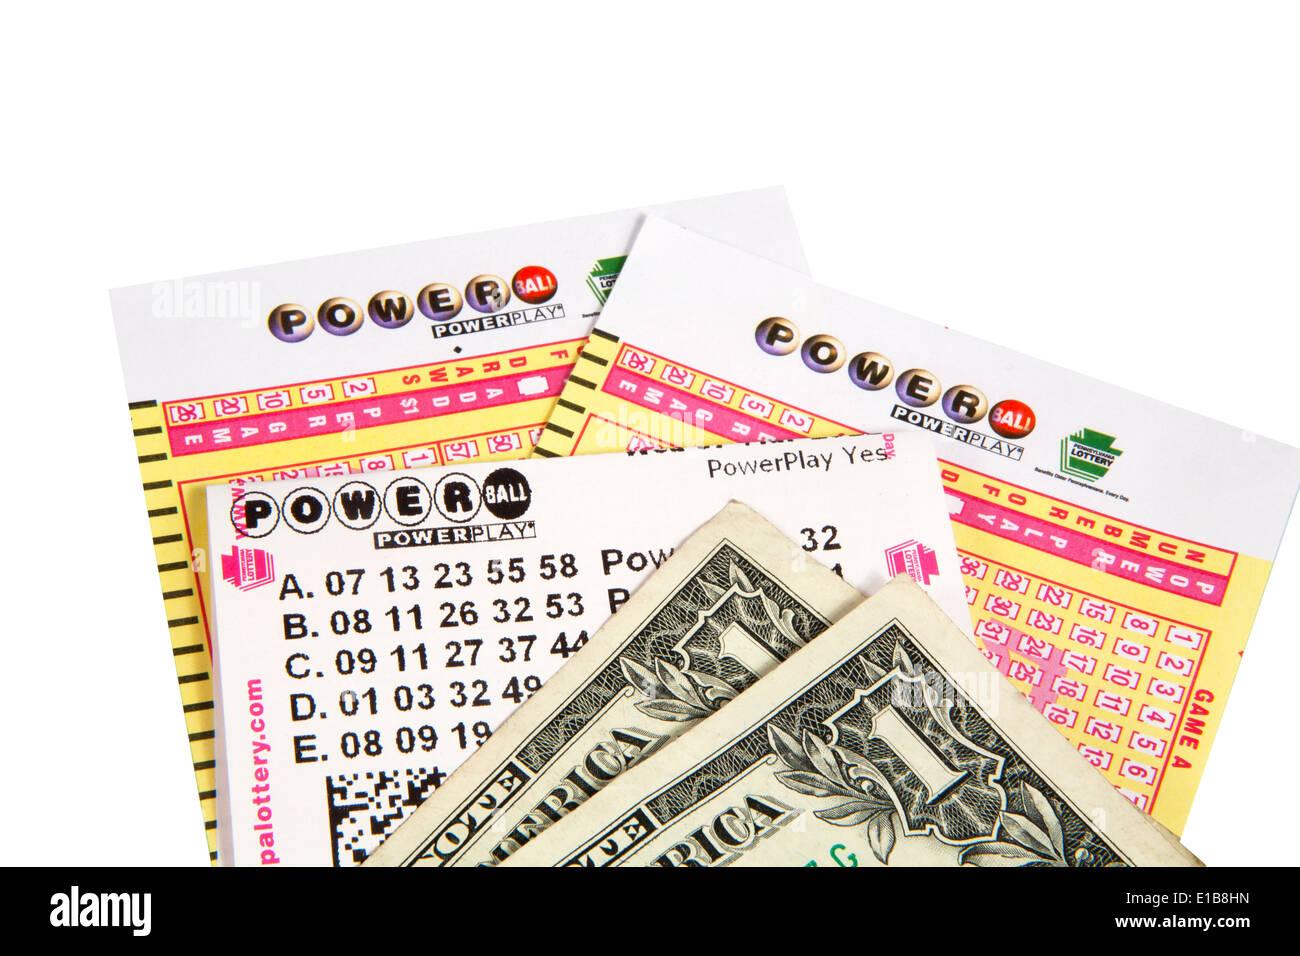 Powerball Lottery Stock Photos & Powerball Lottery Stock Images - Alamy